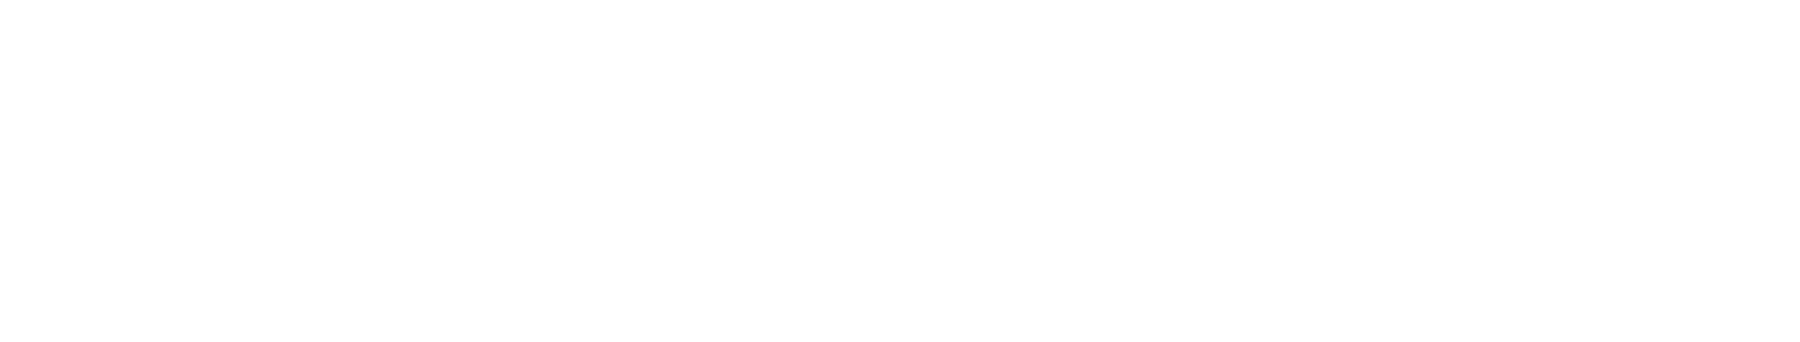 RSRVD